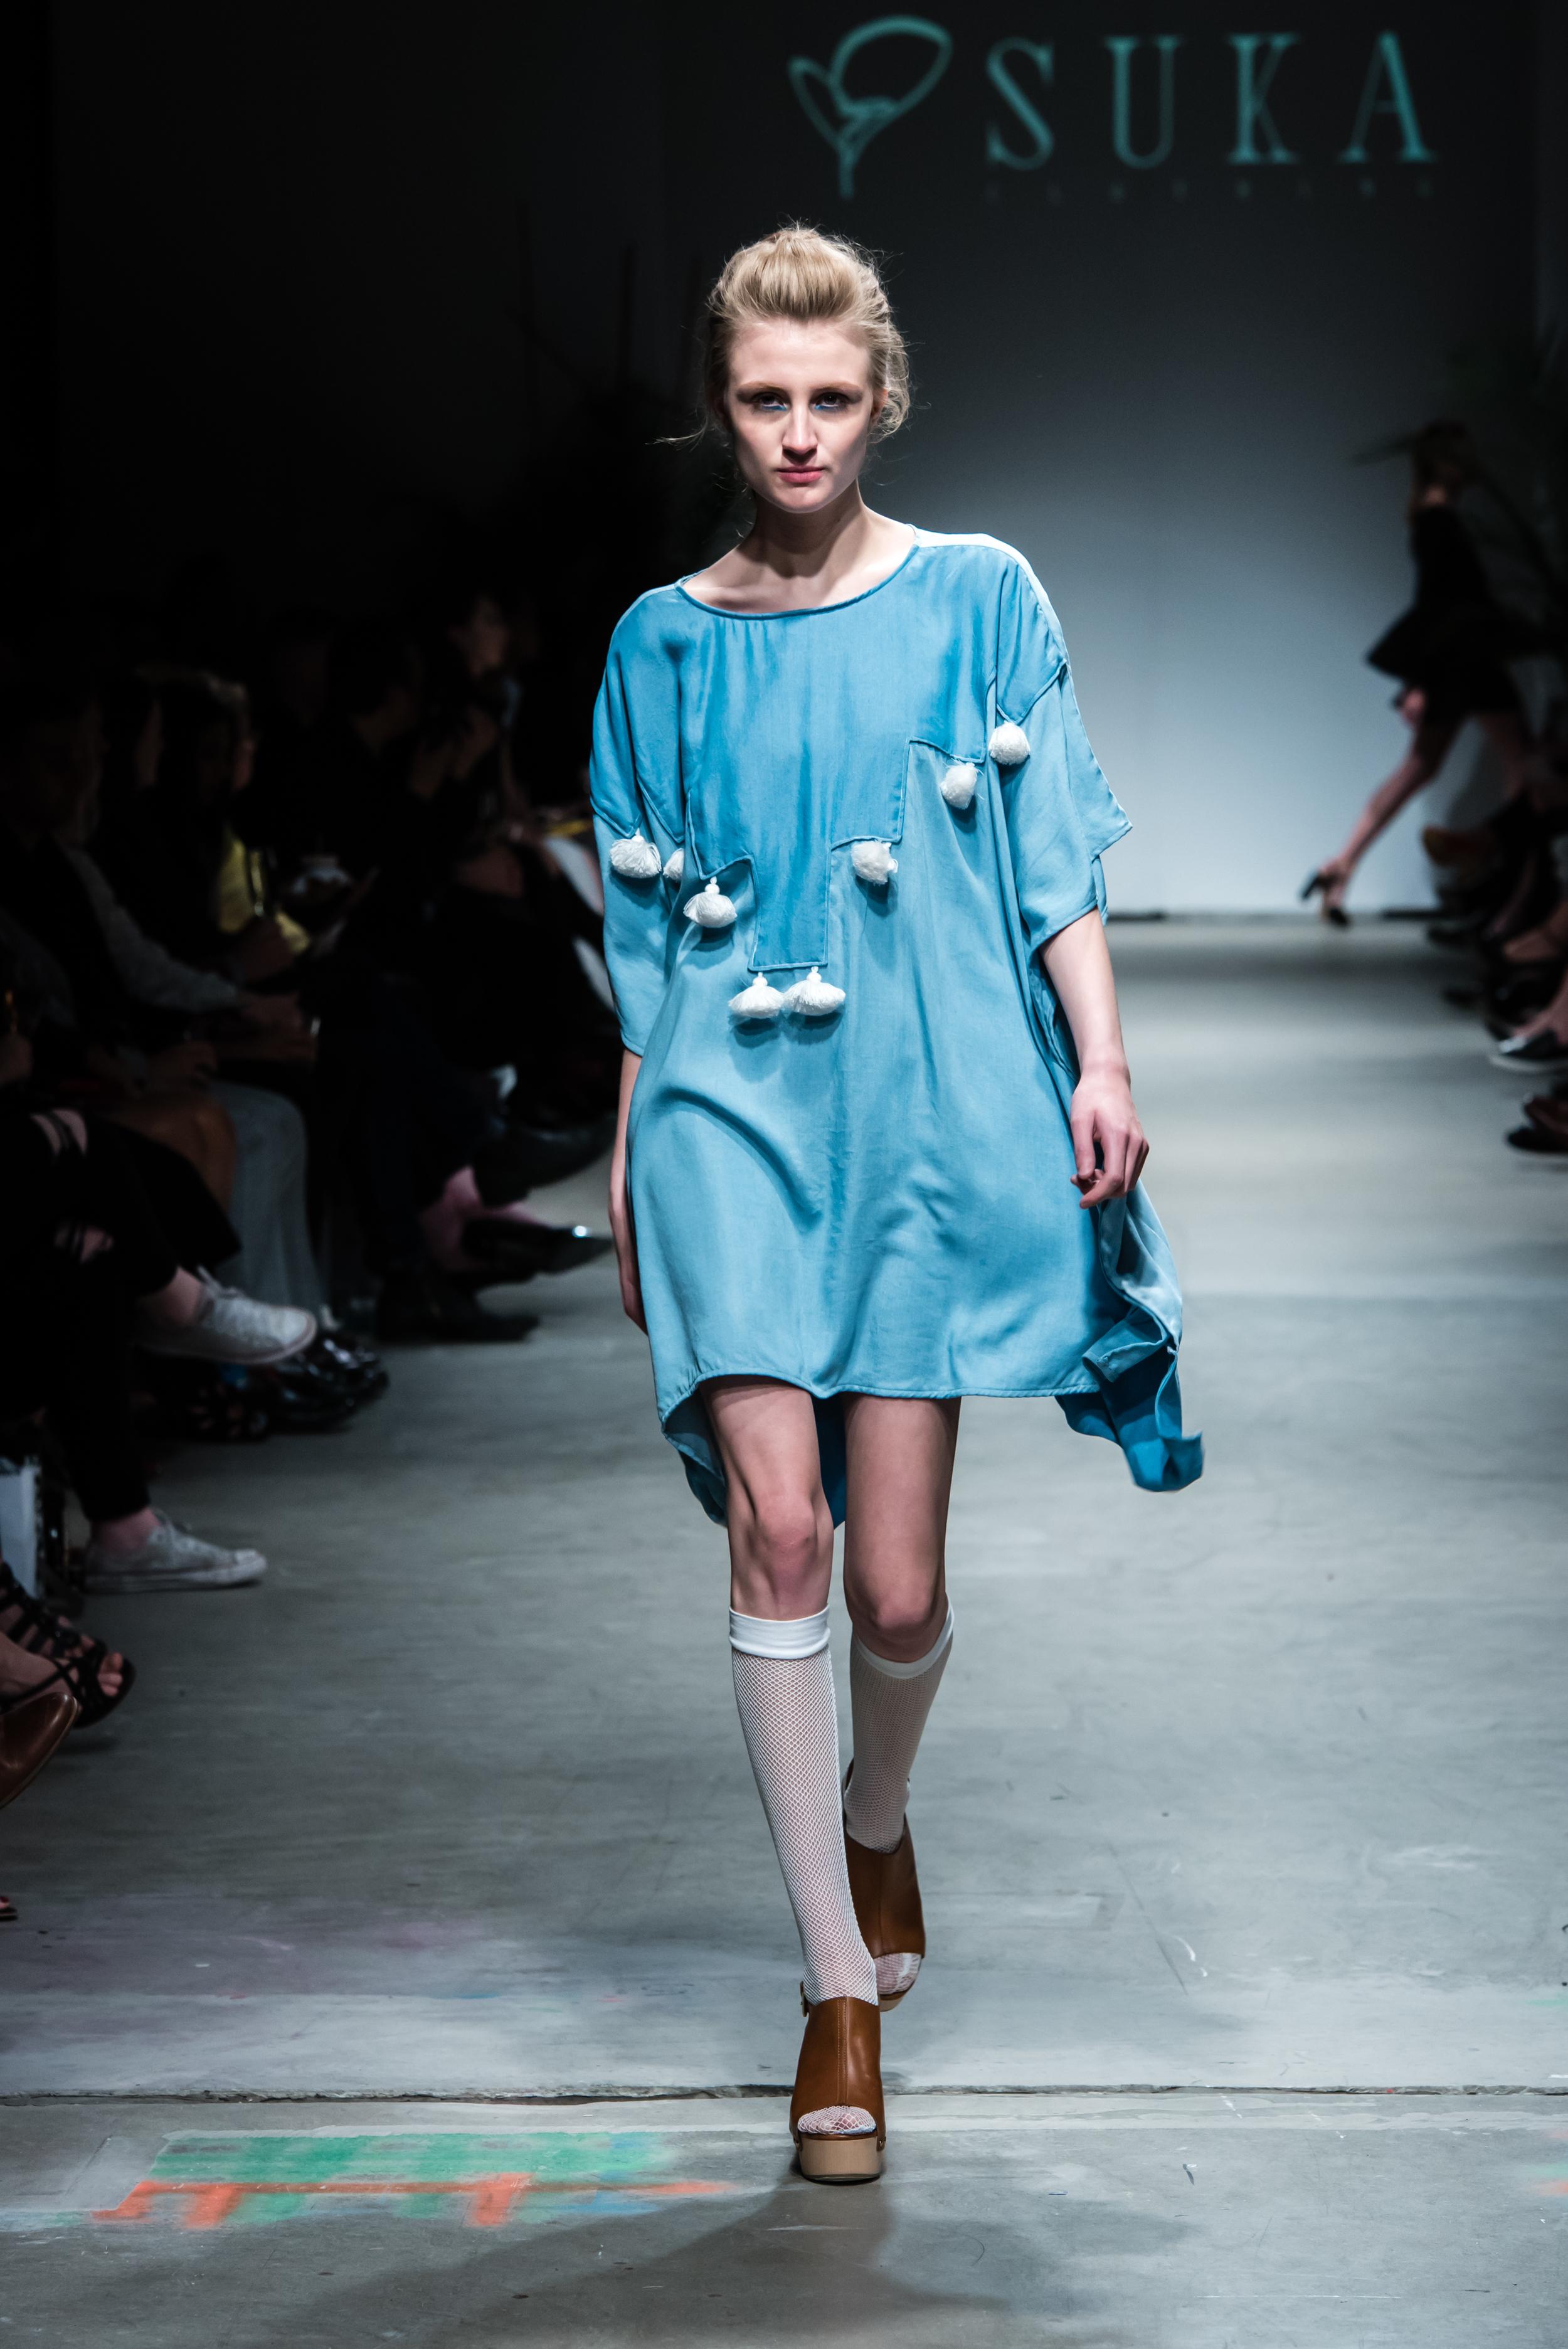 Suka Clothing-Sher Khan Niazi-7485.jpg